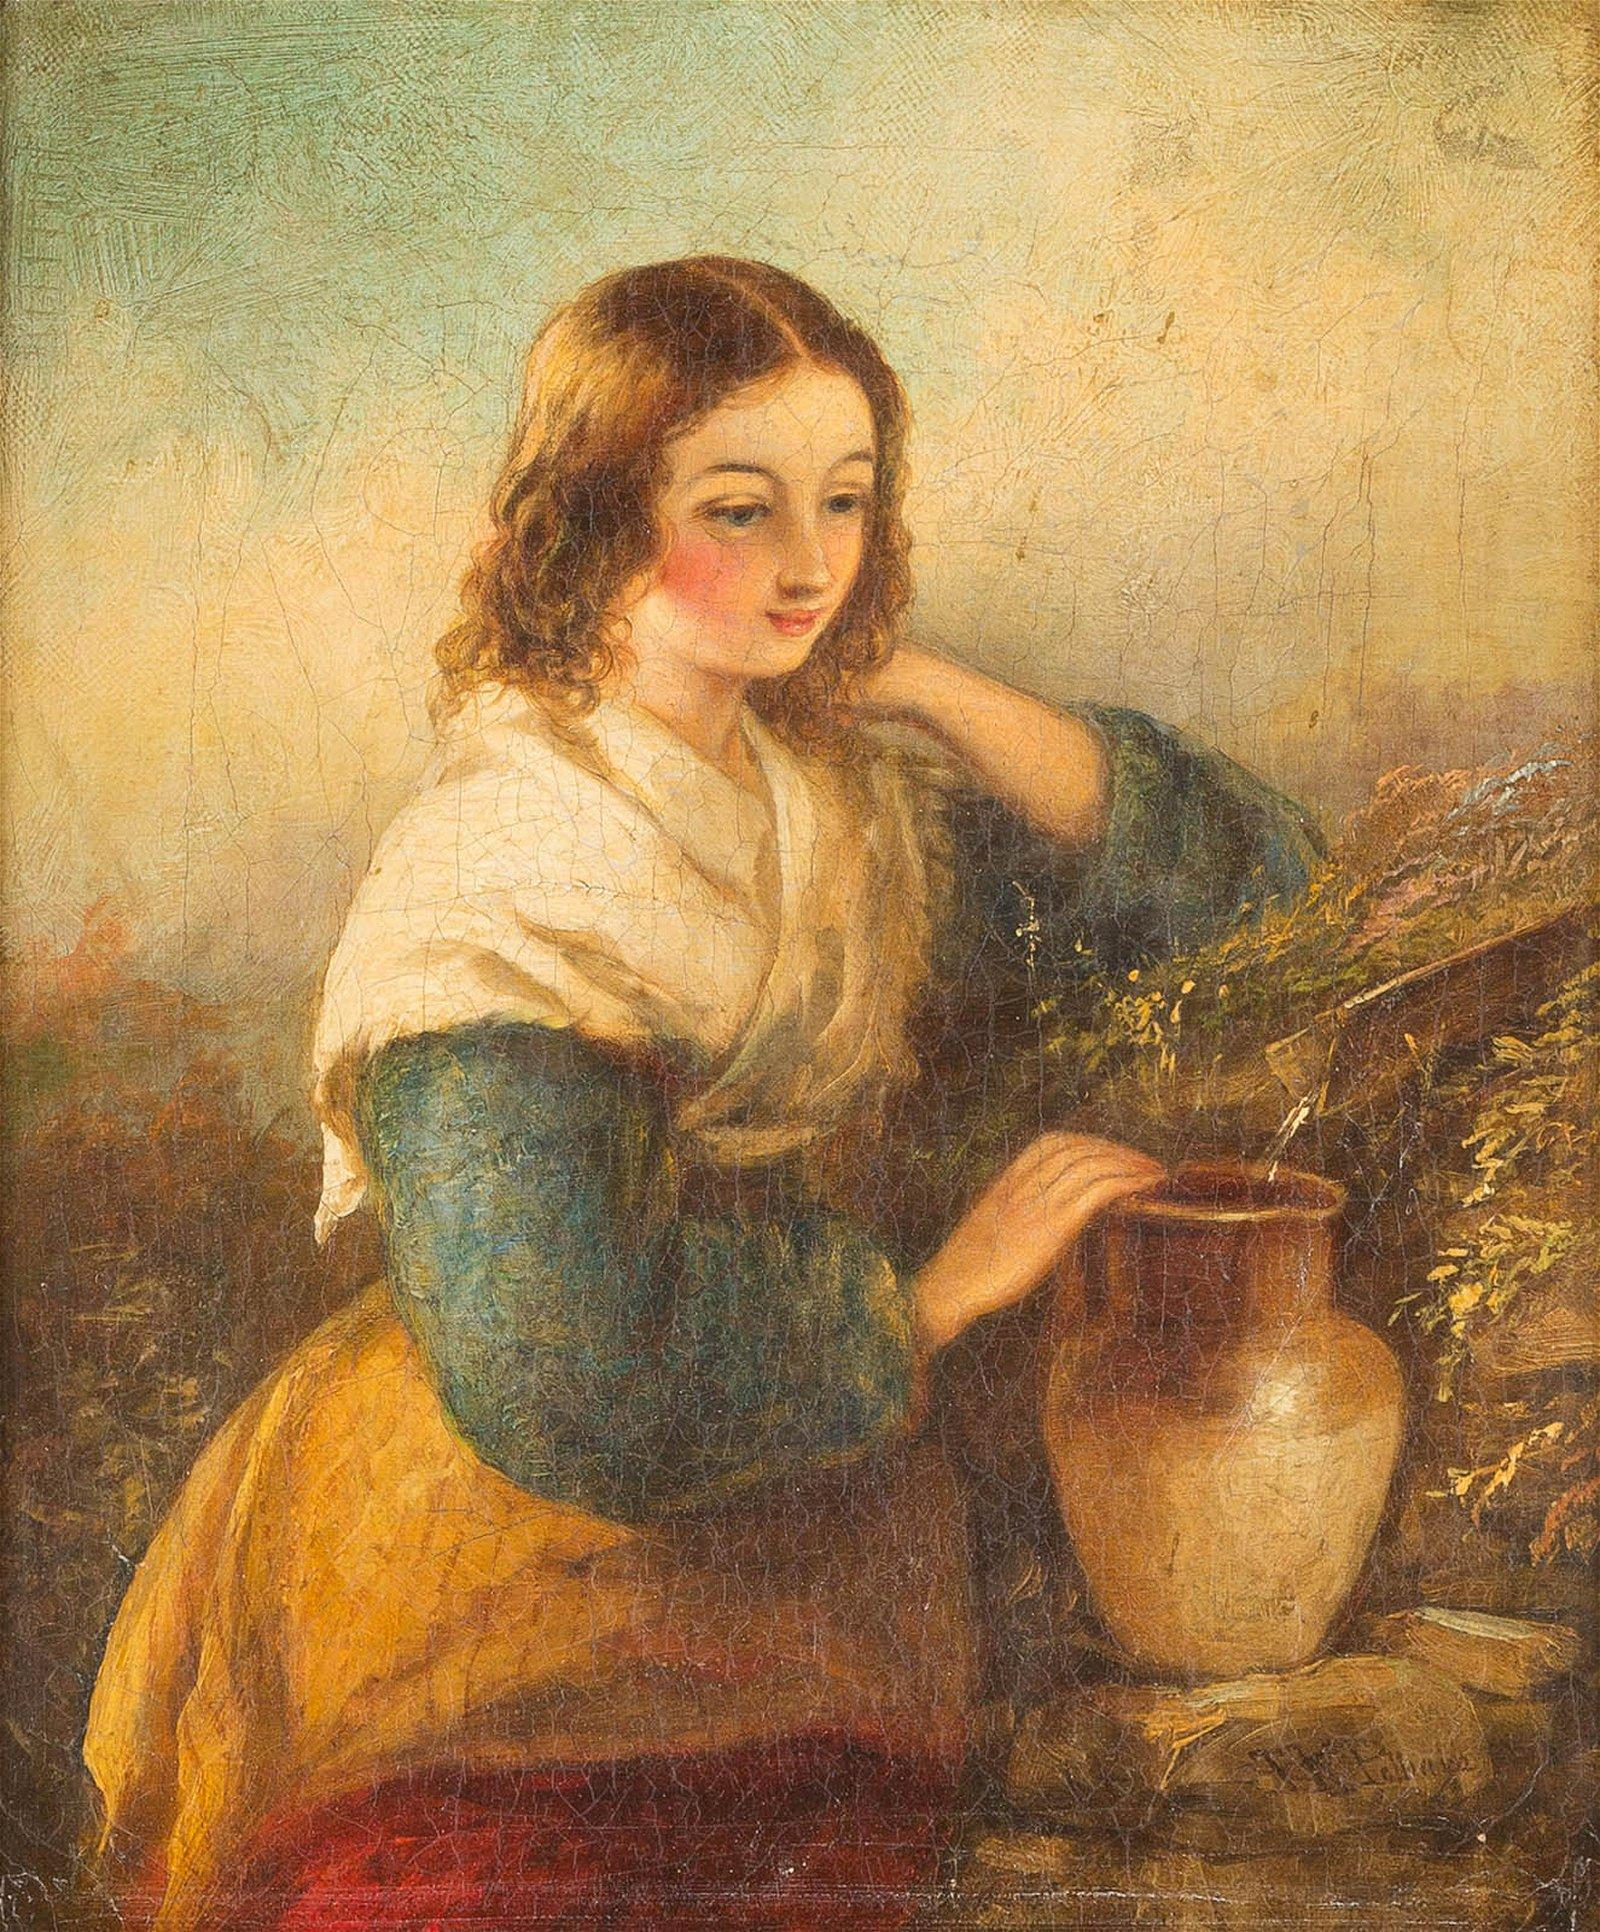 THOMAS KENT PELHAM Act. c. 1860 - c. 1891 London Girl